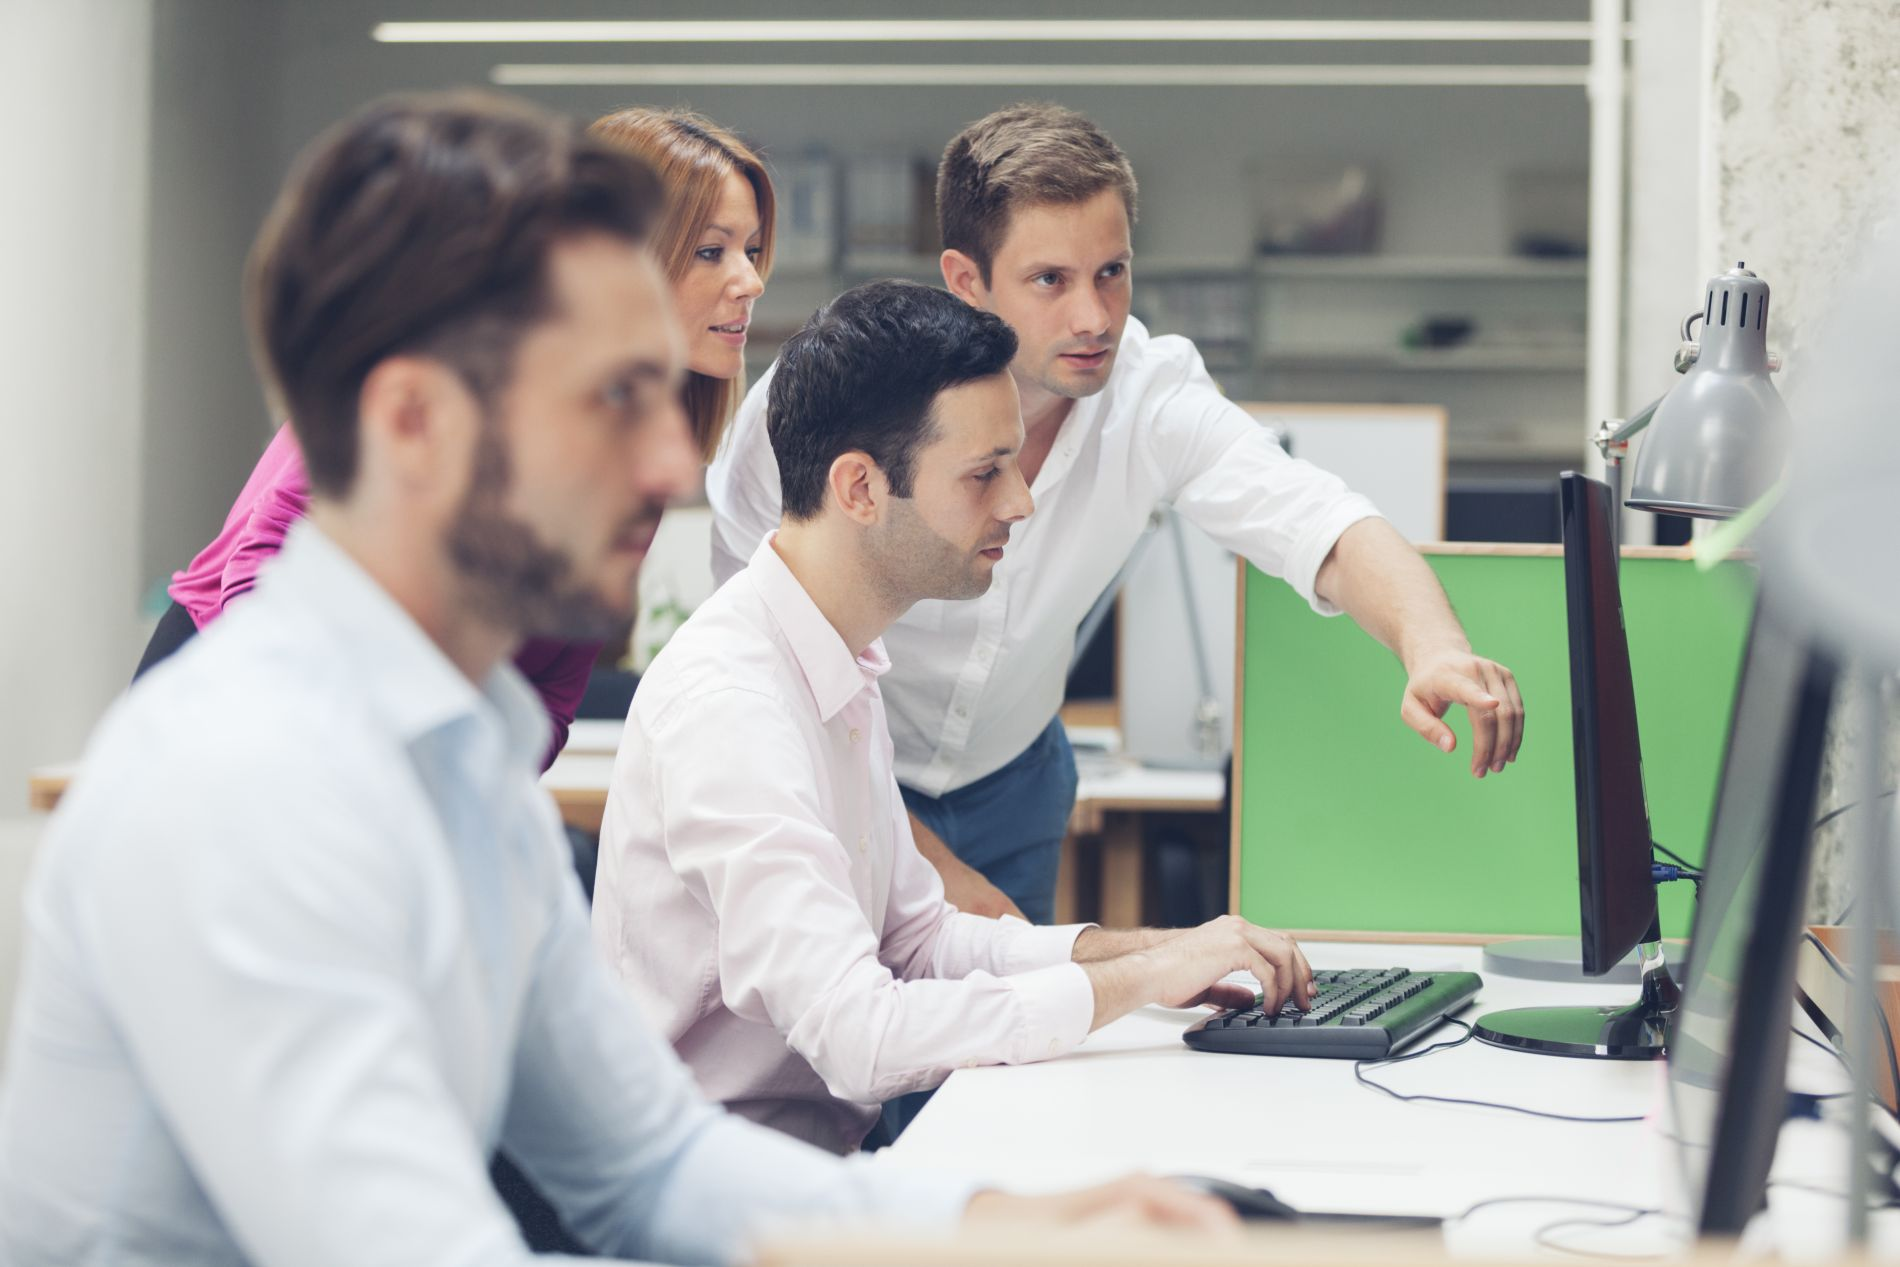 Lean Practitioner dla usług i biura, Lean Enterprise Institute Polska